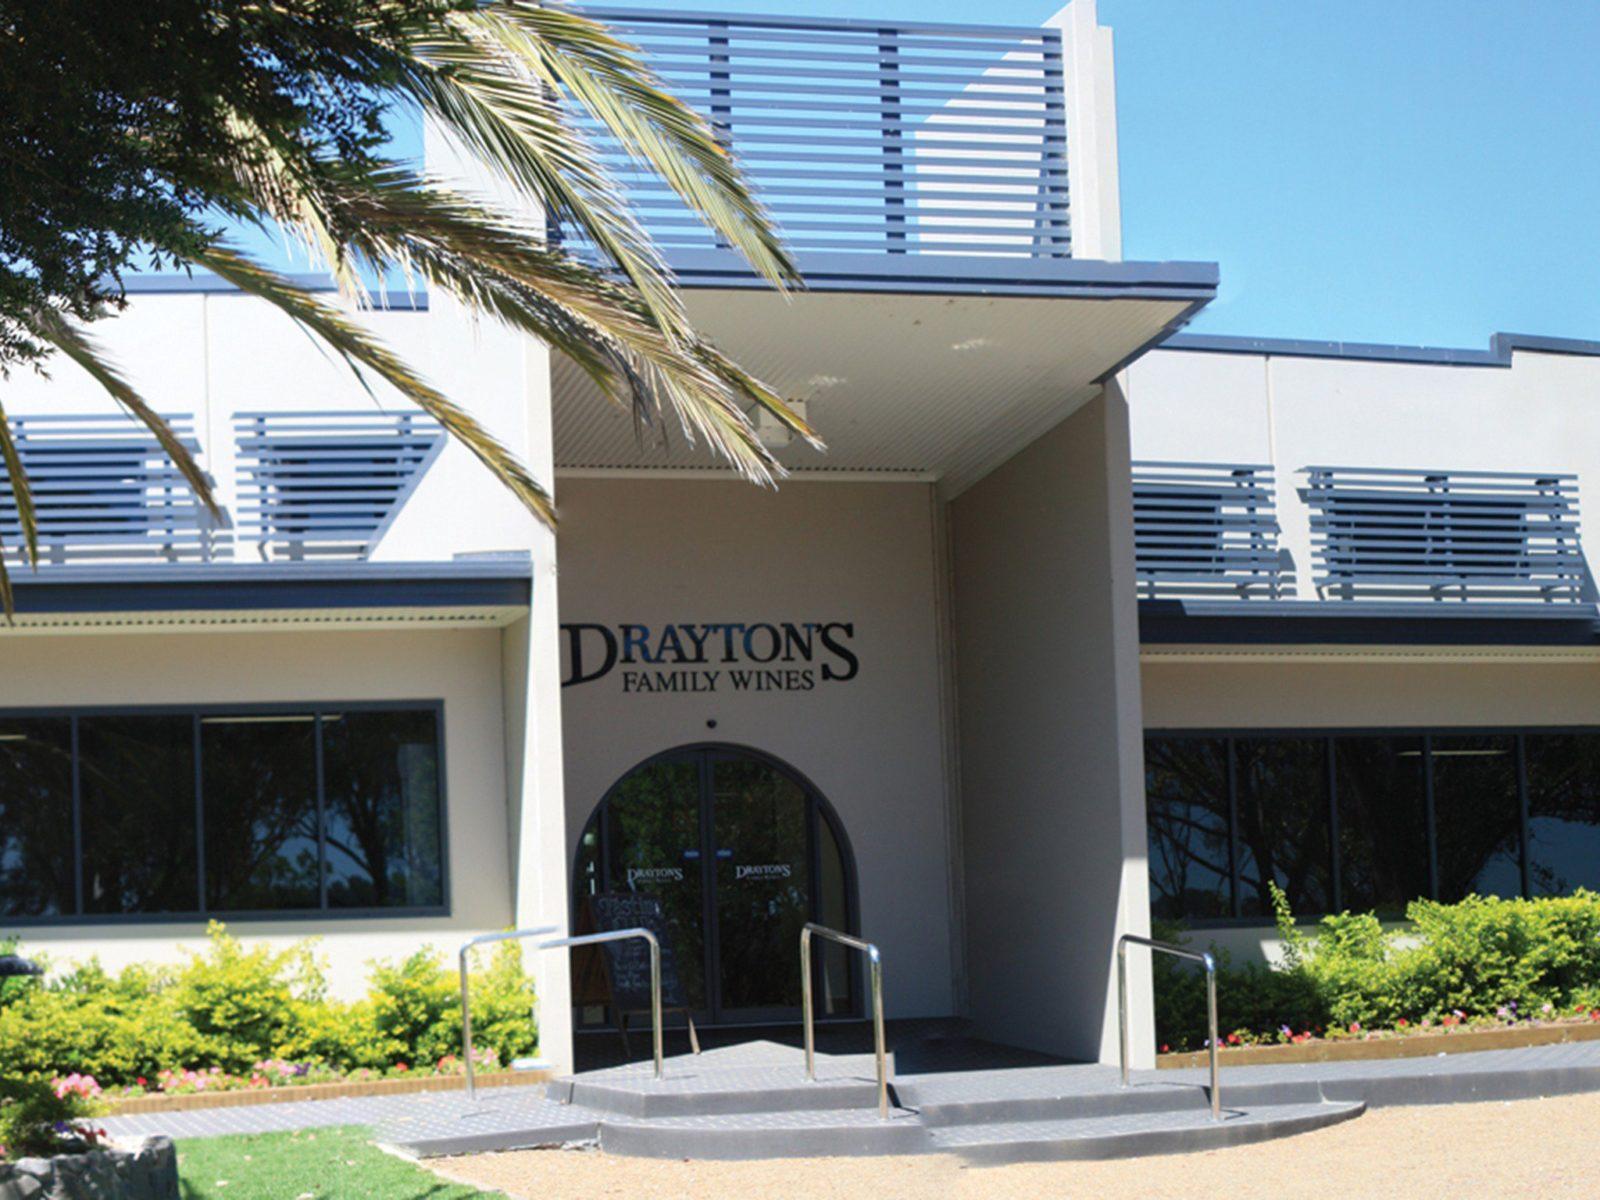 Drayton's Family Wines Cellar Door